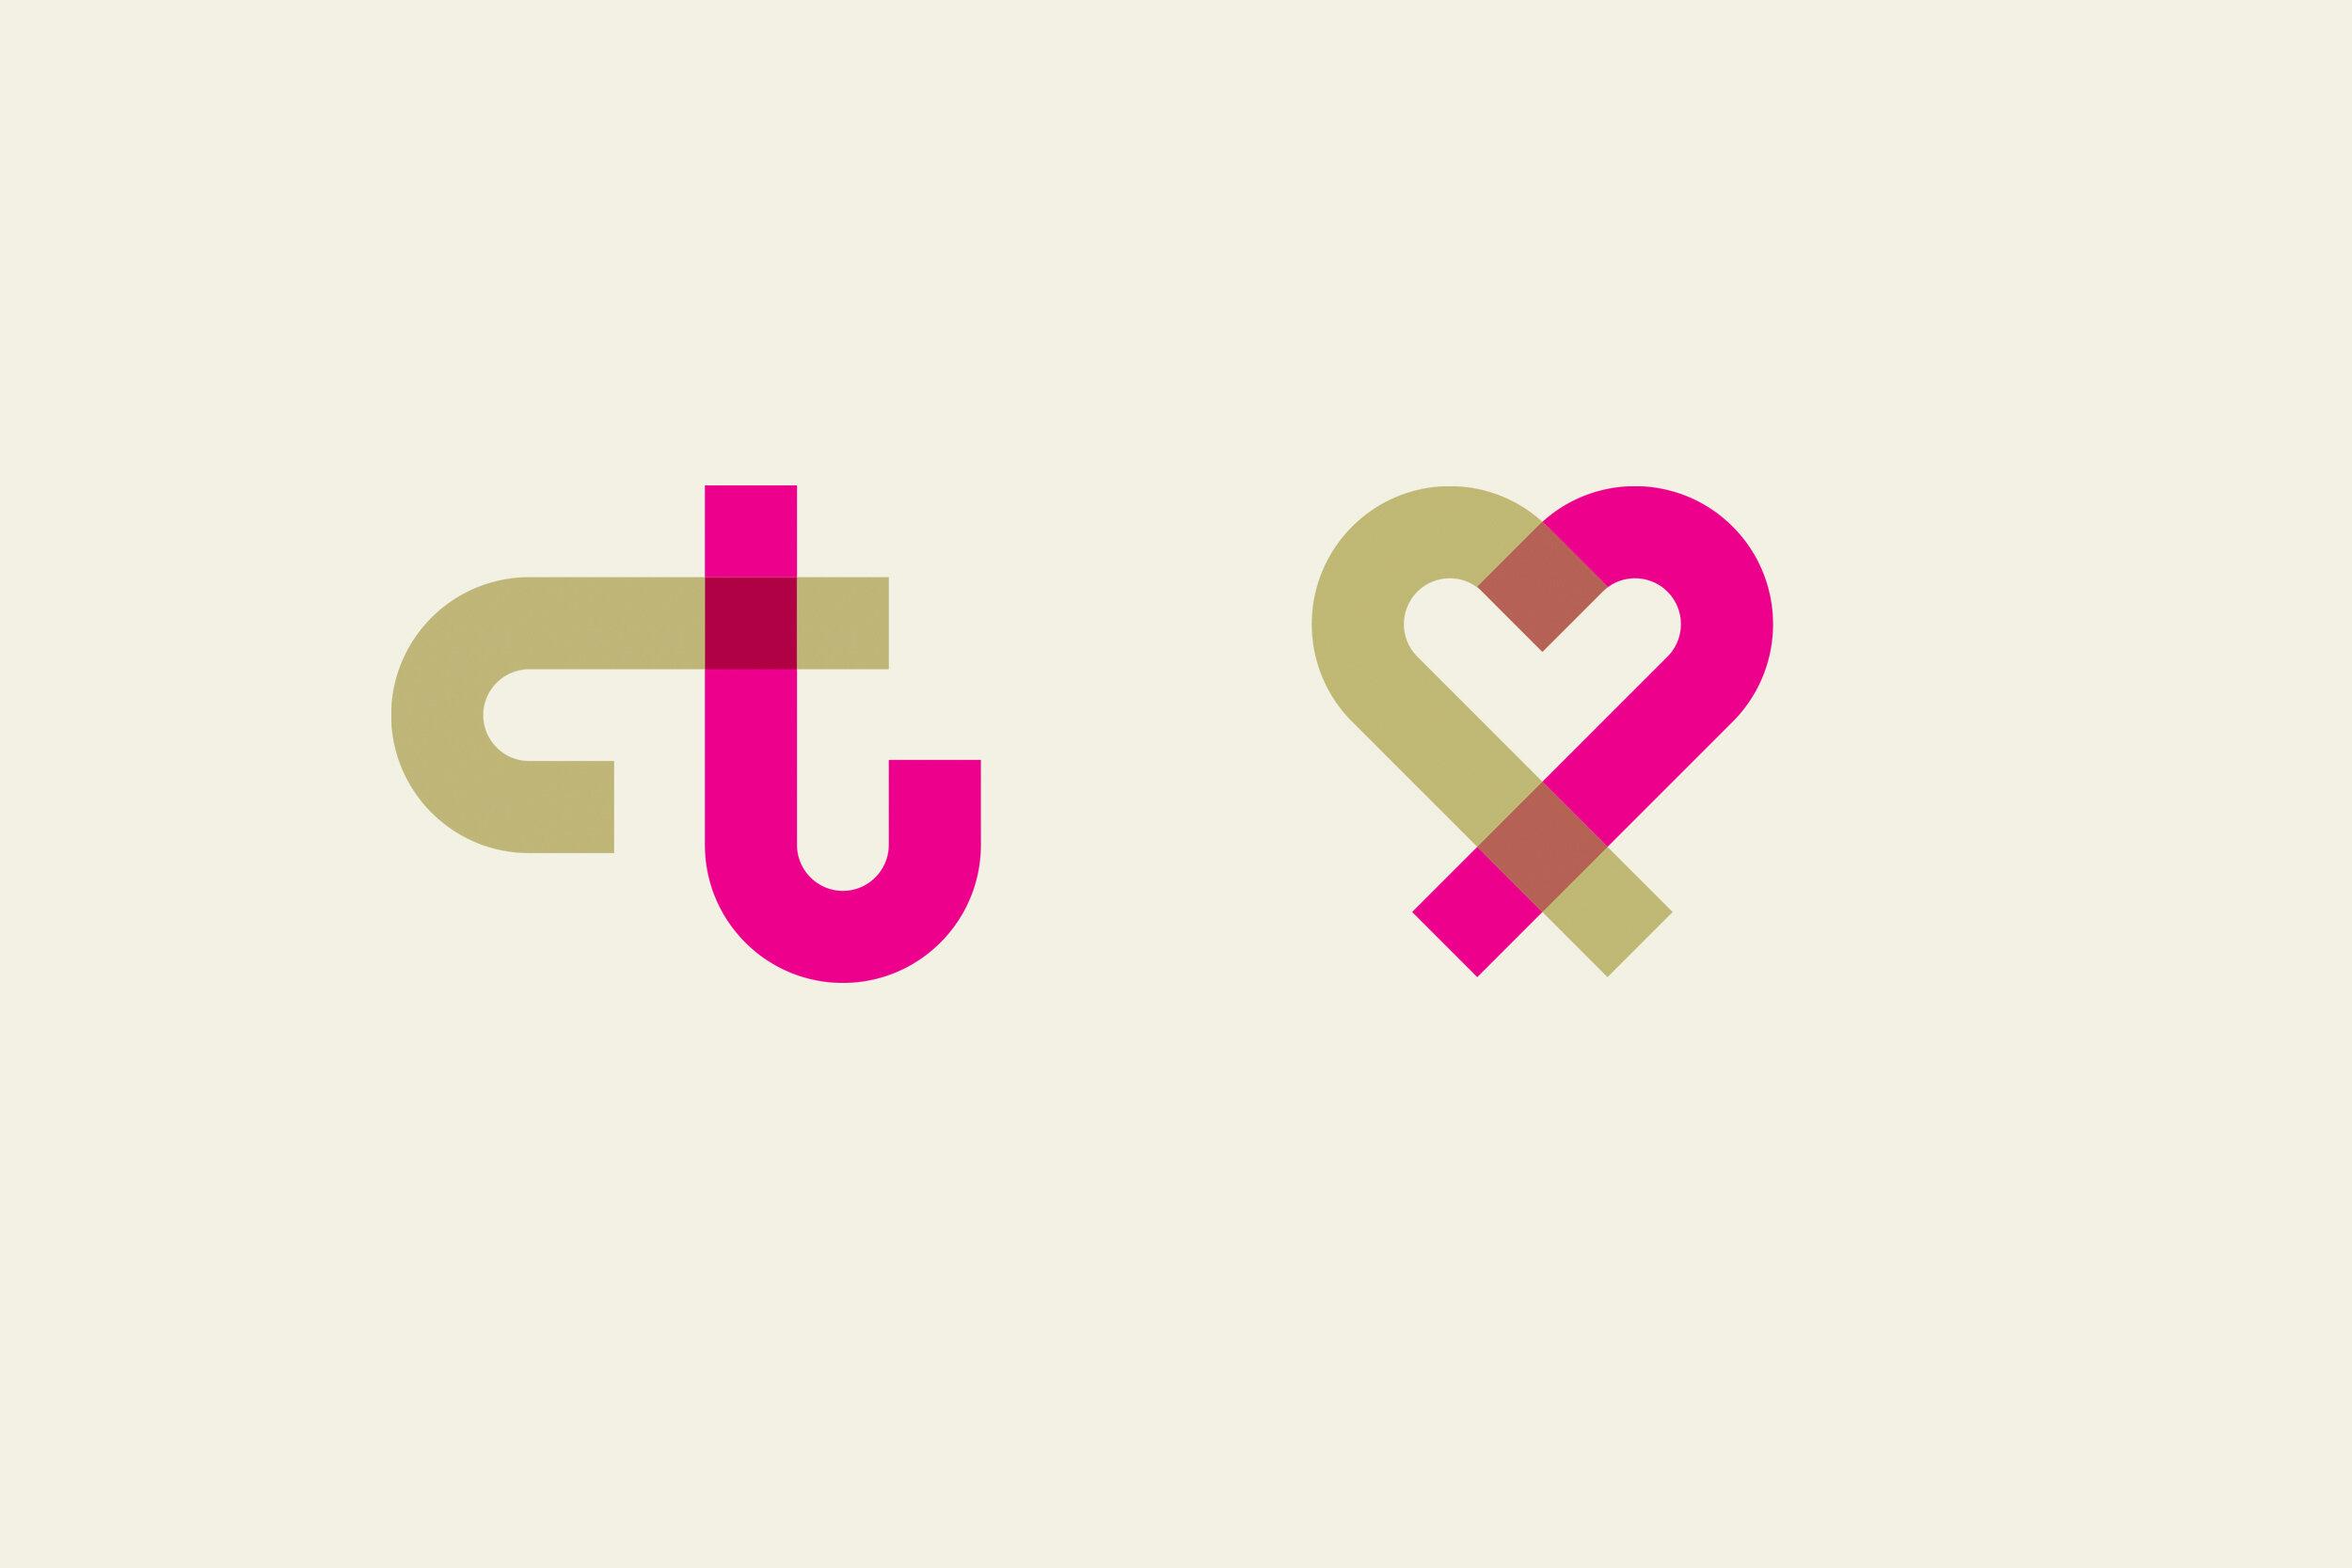 Logo_CultuurschipThor2_Shortlife.jpg